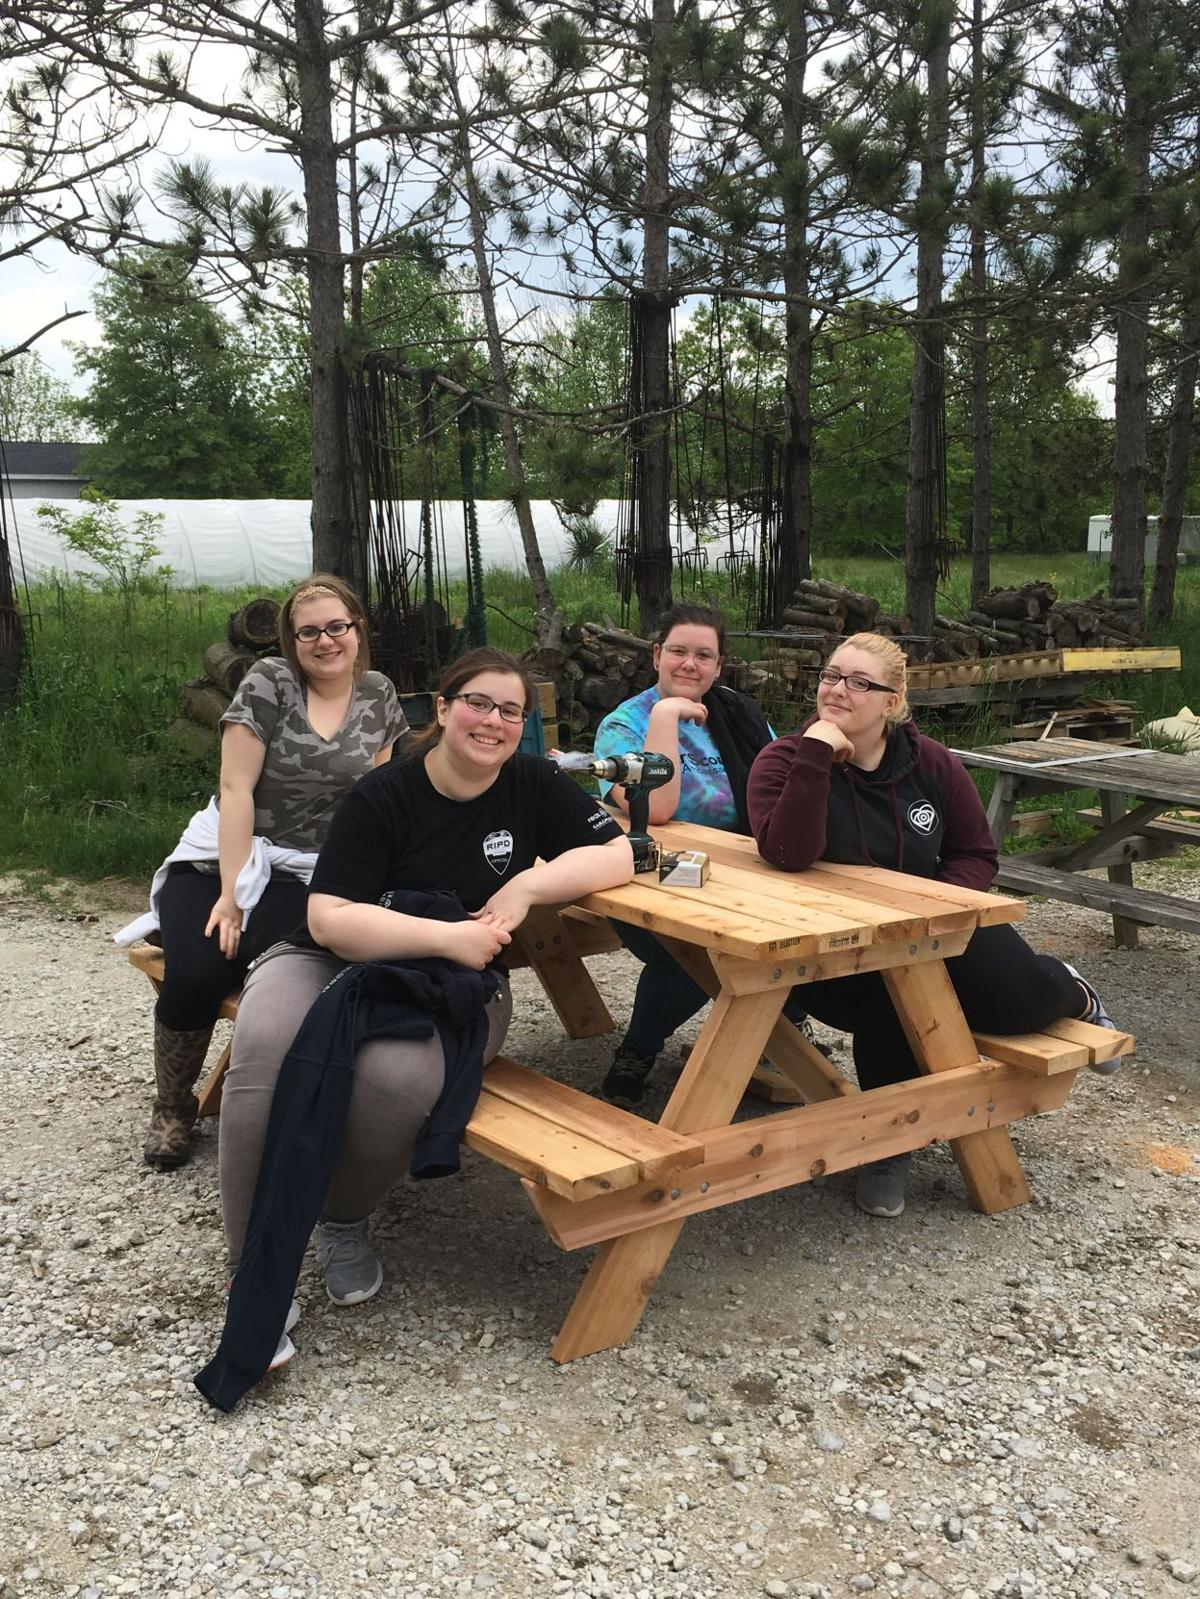 Ambassador Girl Scouts volunteer at Taltree Arboretum & Gardens